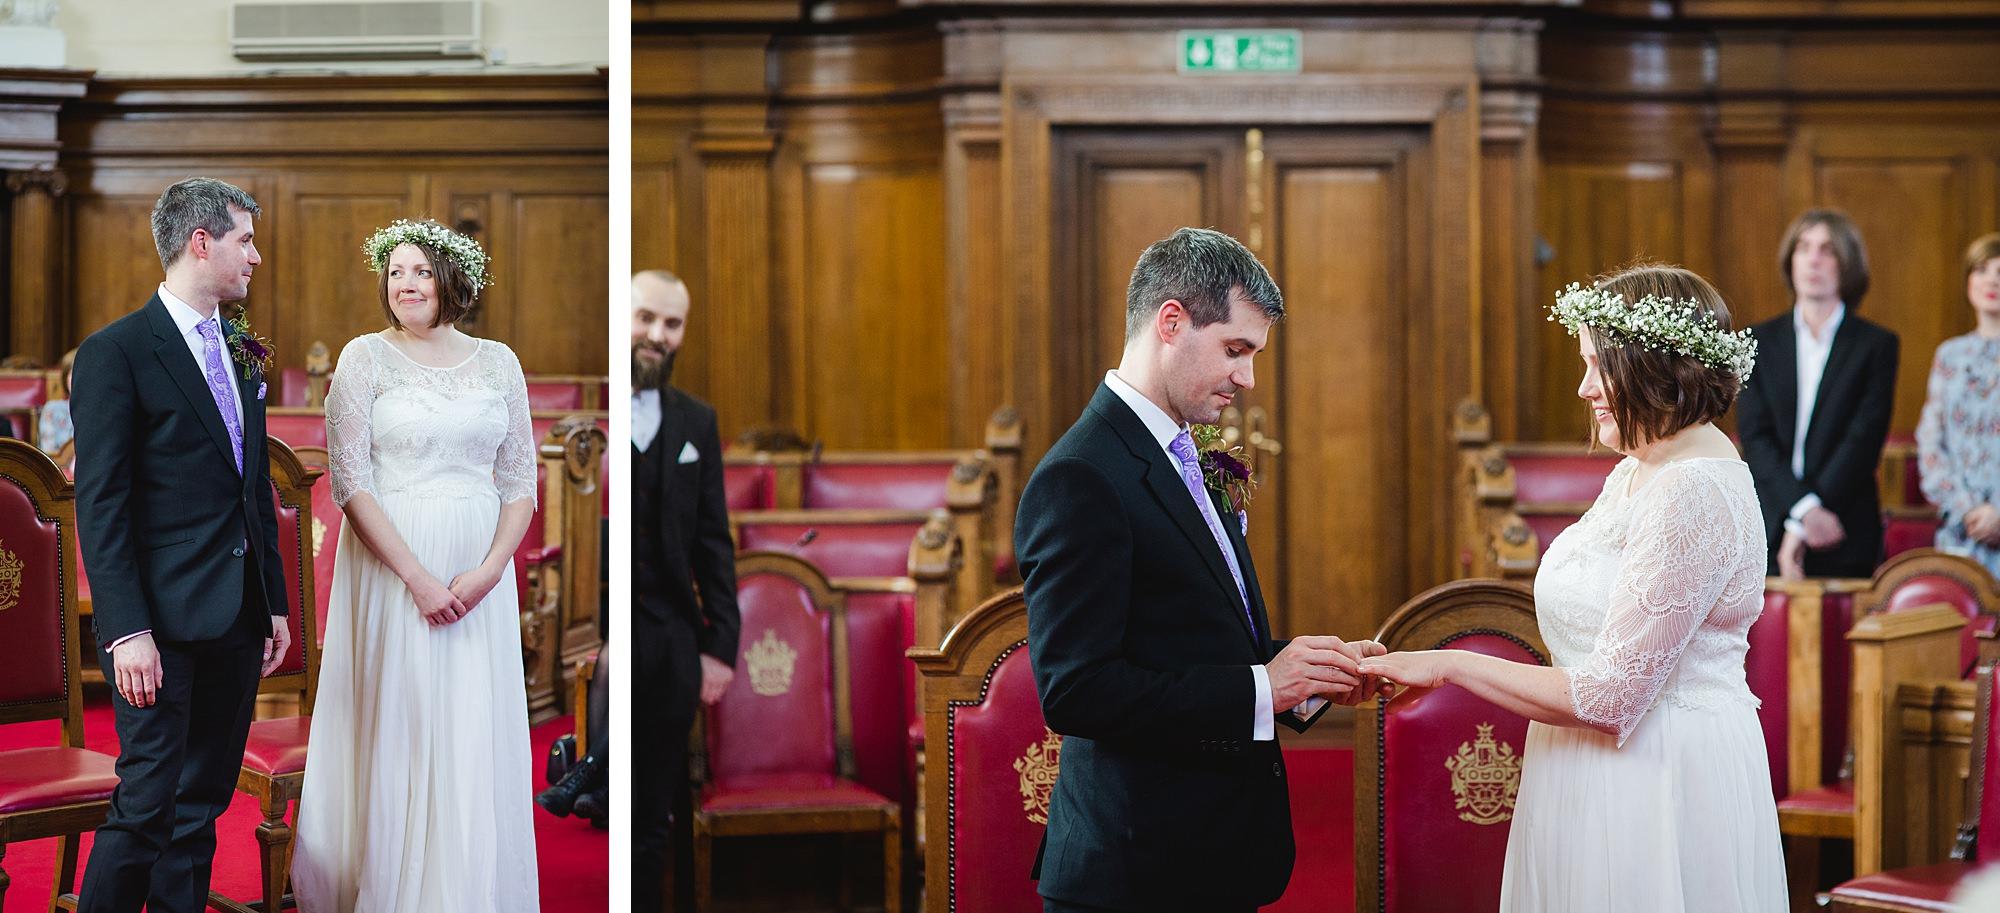 fun london wedding bowling bride and groom exchange rings